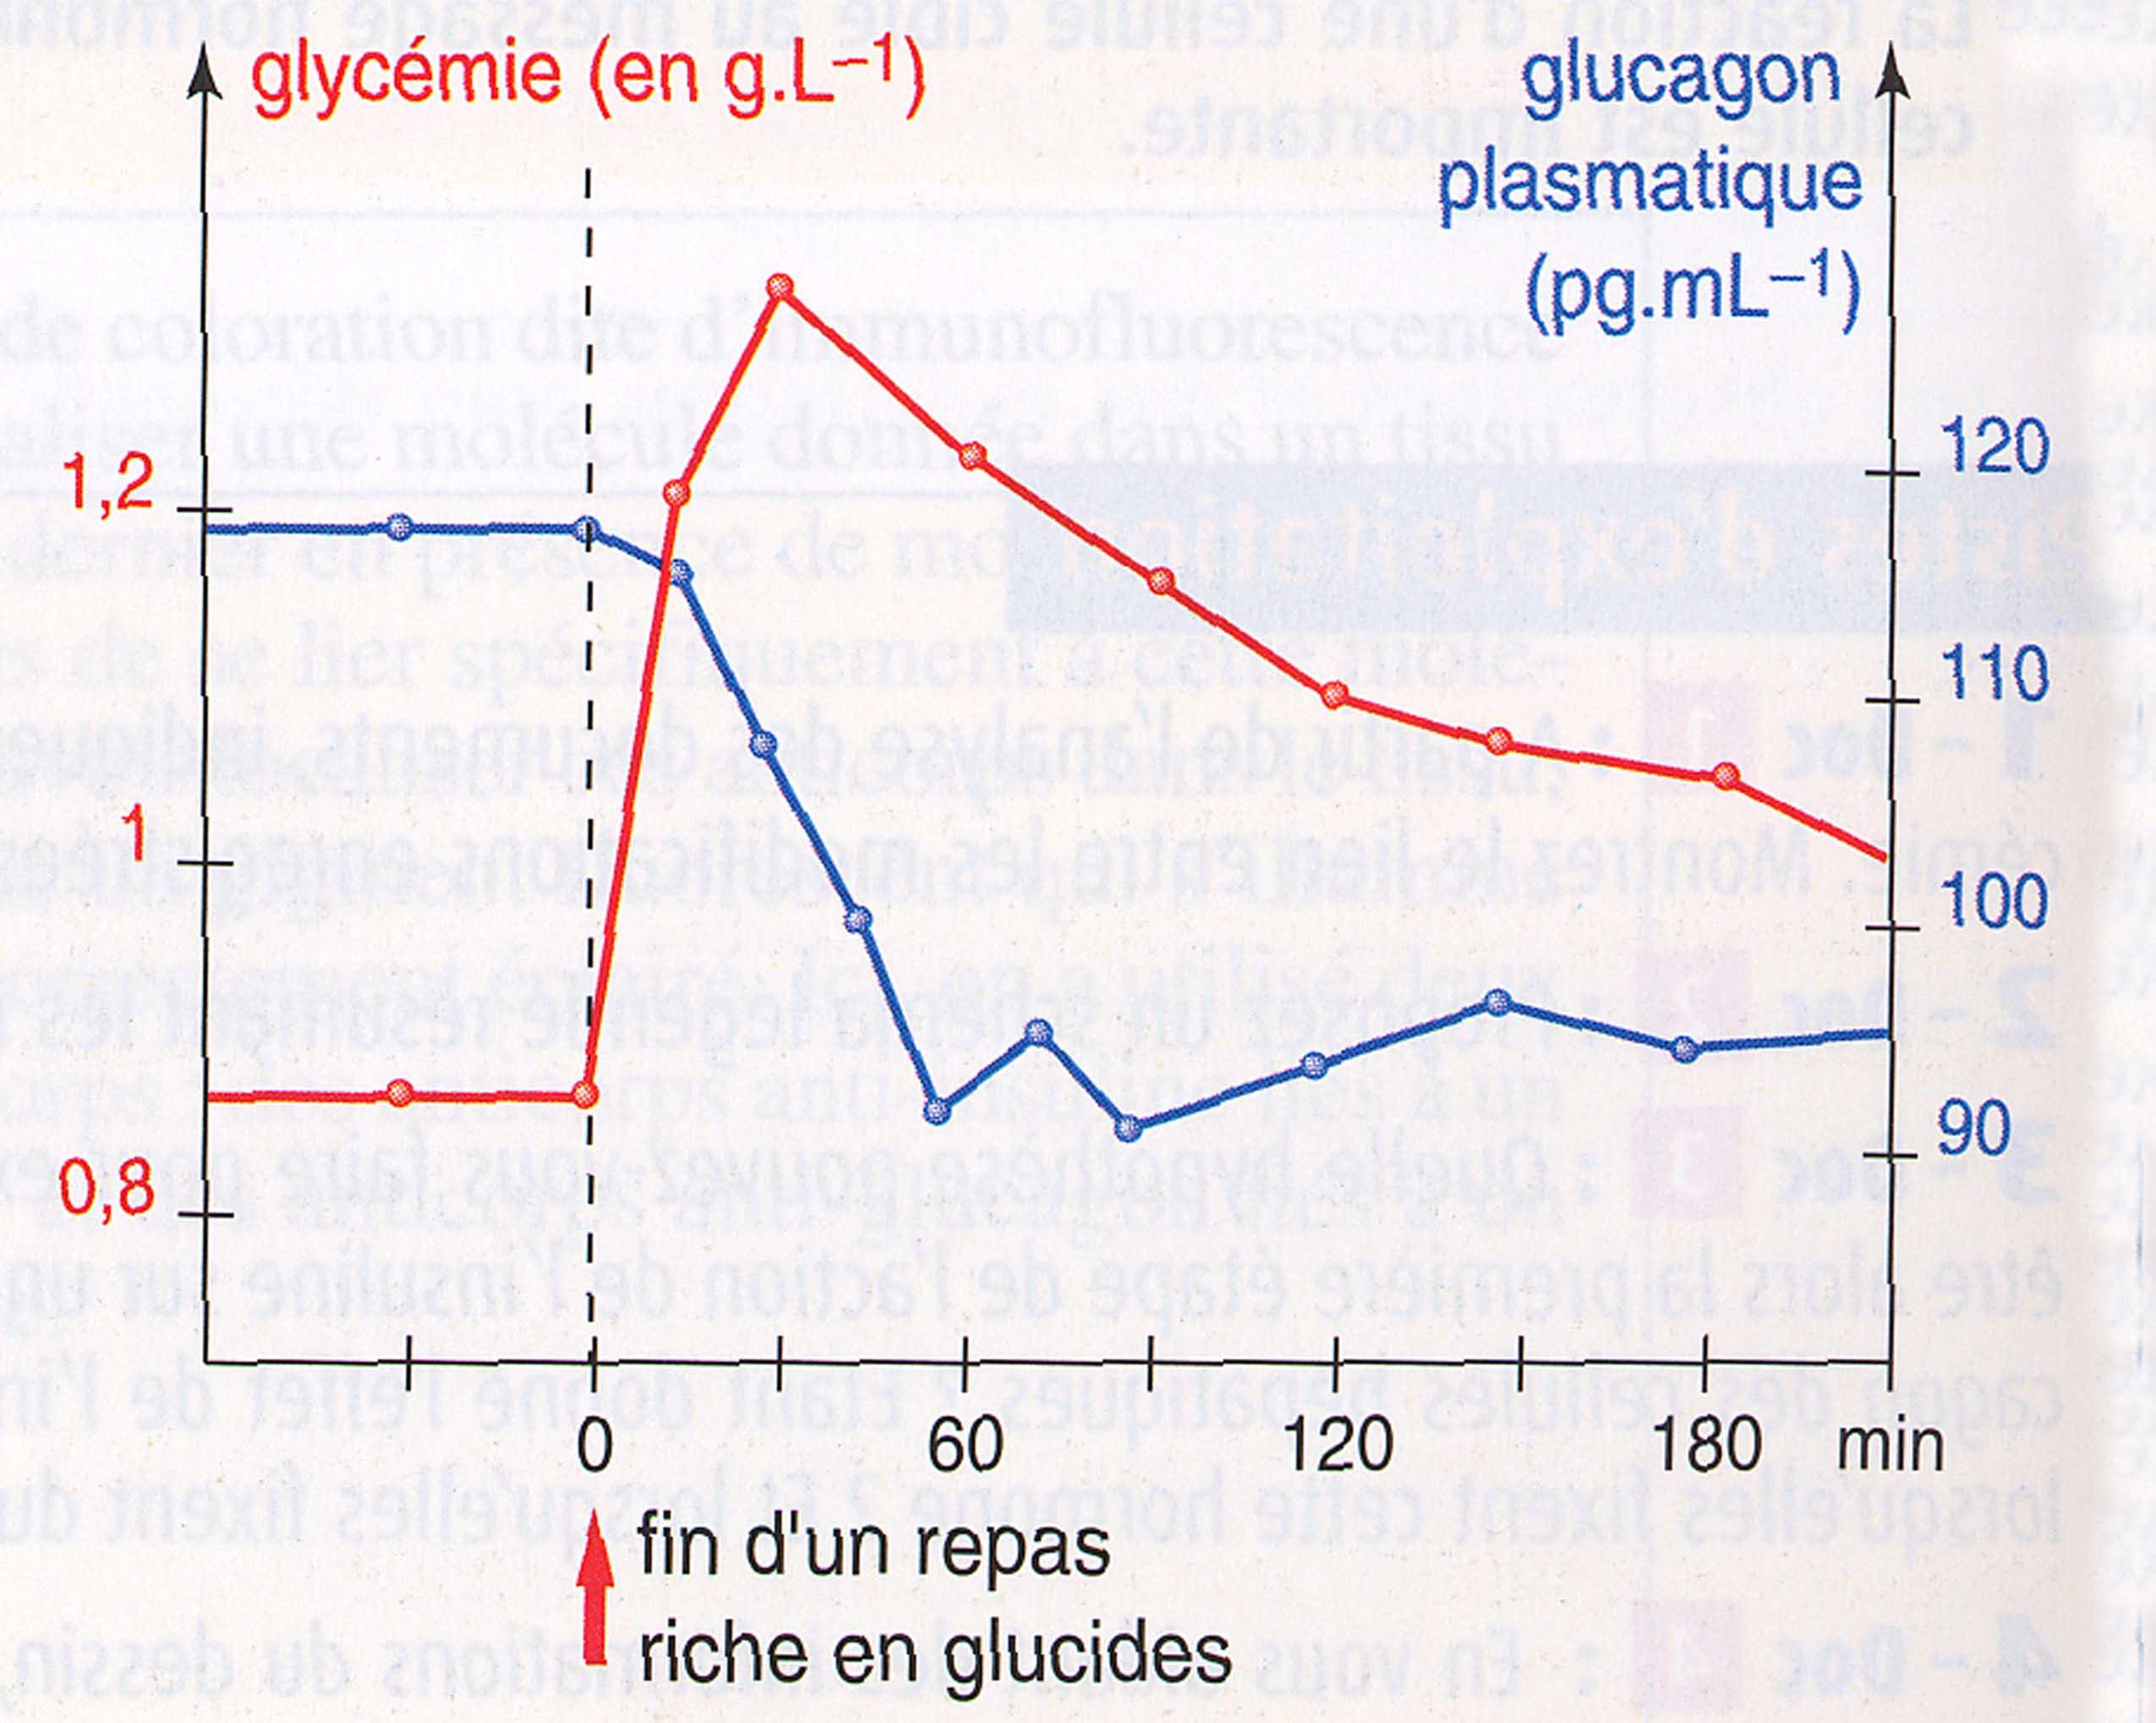 Glucagon post-prandial